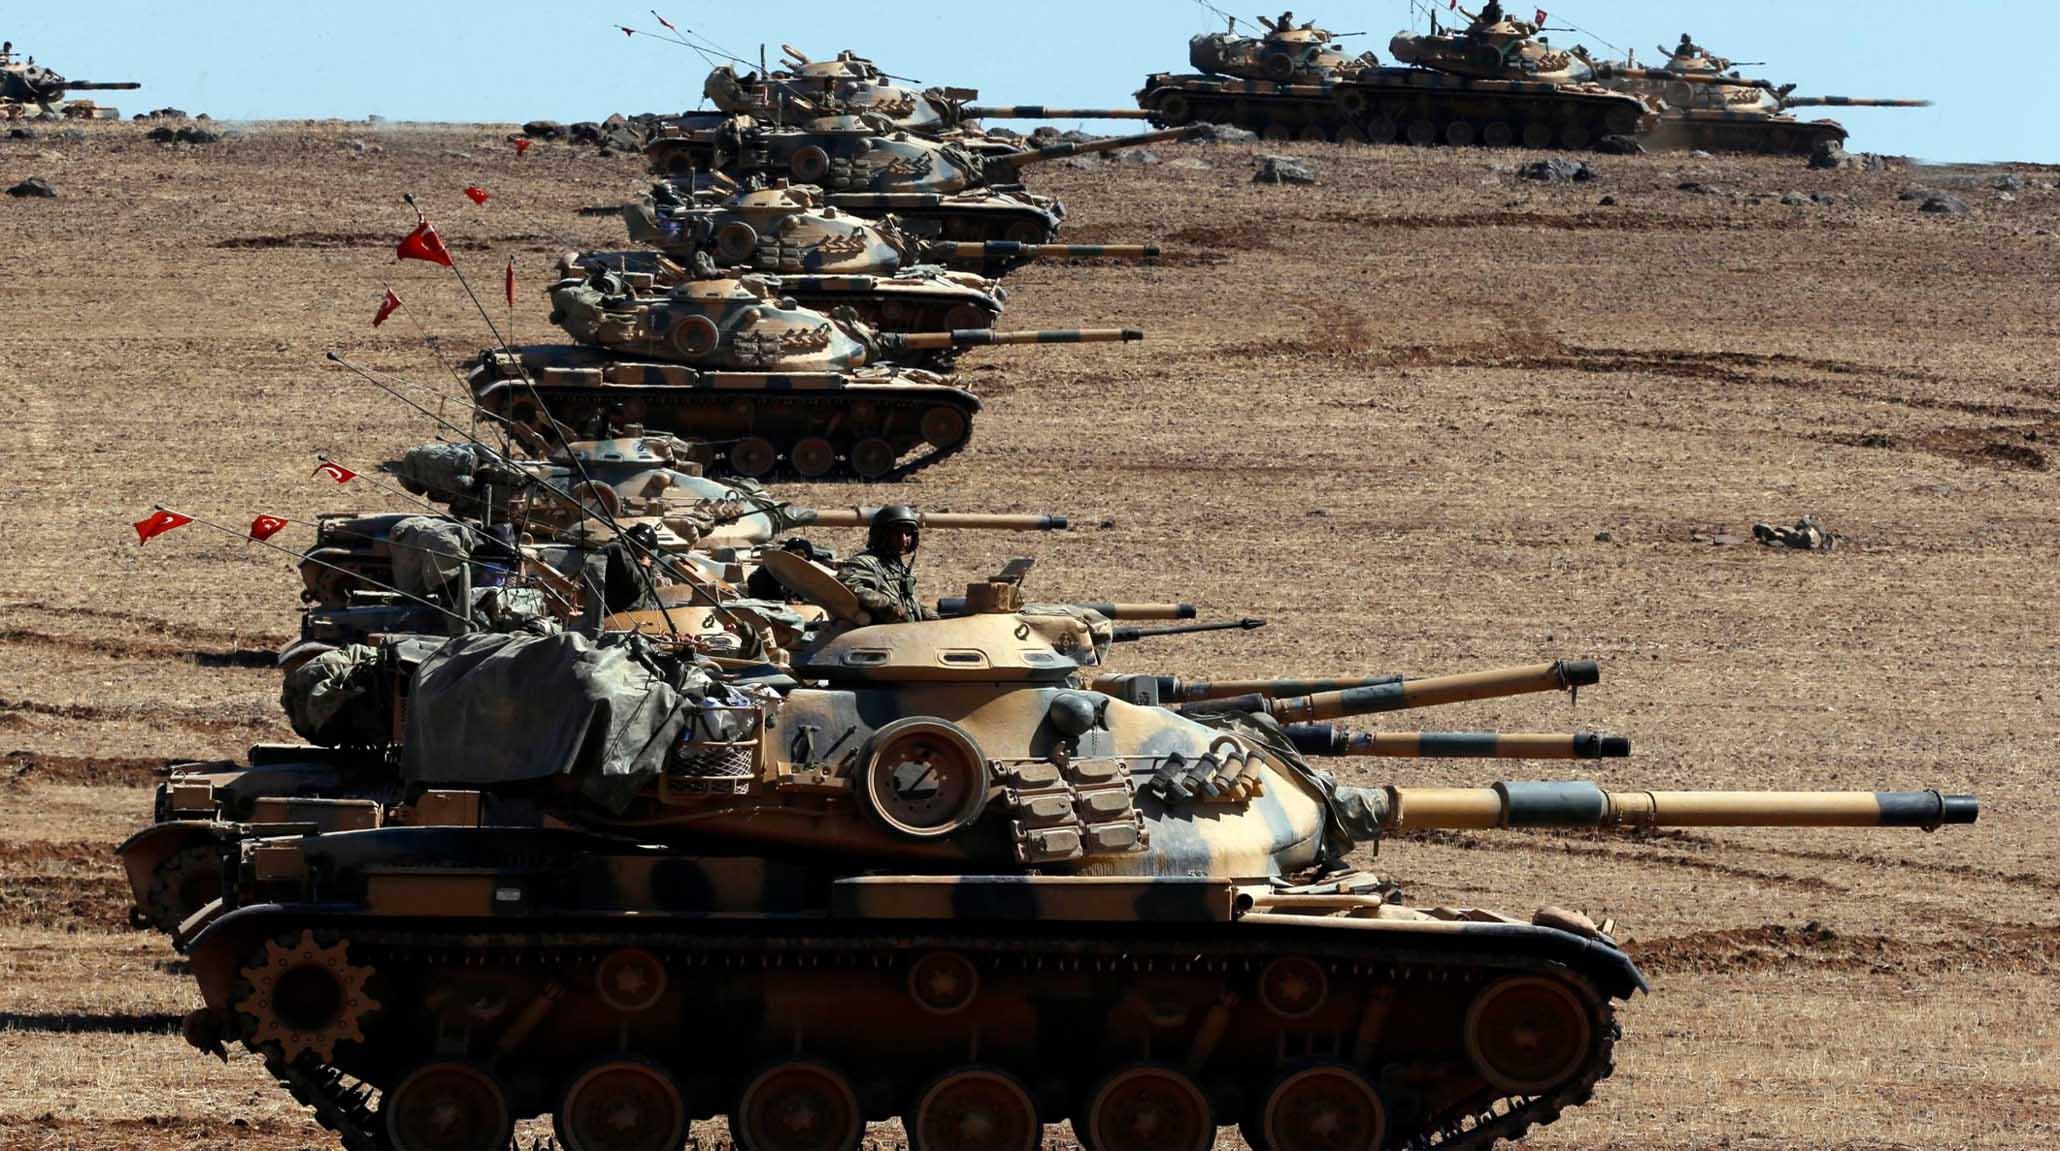 https://mato48.files.wordpress.com/2015/02/suleyman-shah-2-tanks.jpg